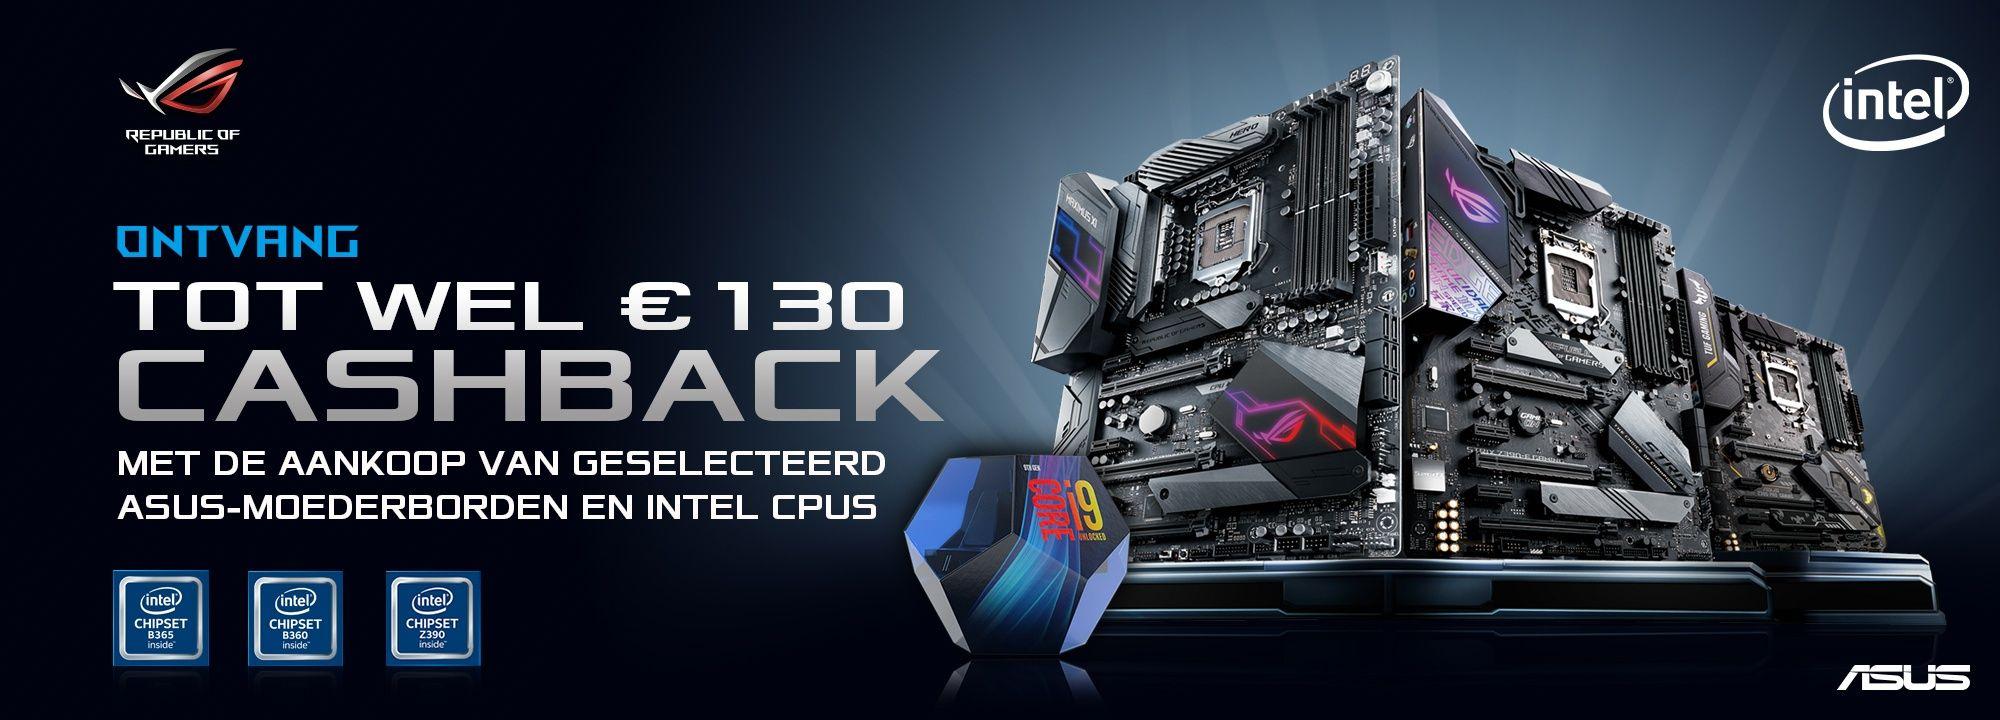 Cashback bij Asus moederbord + Intel CPU